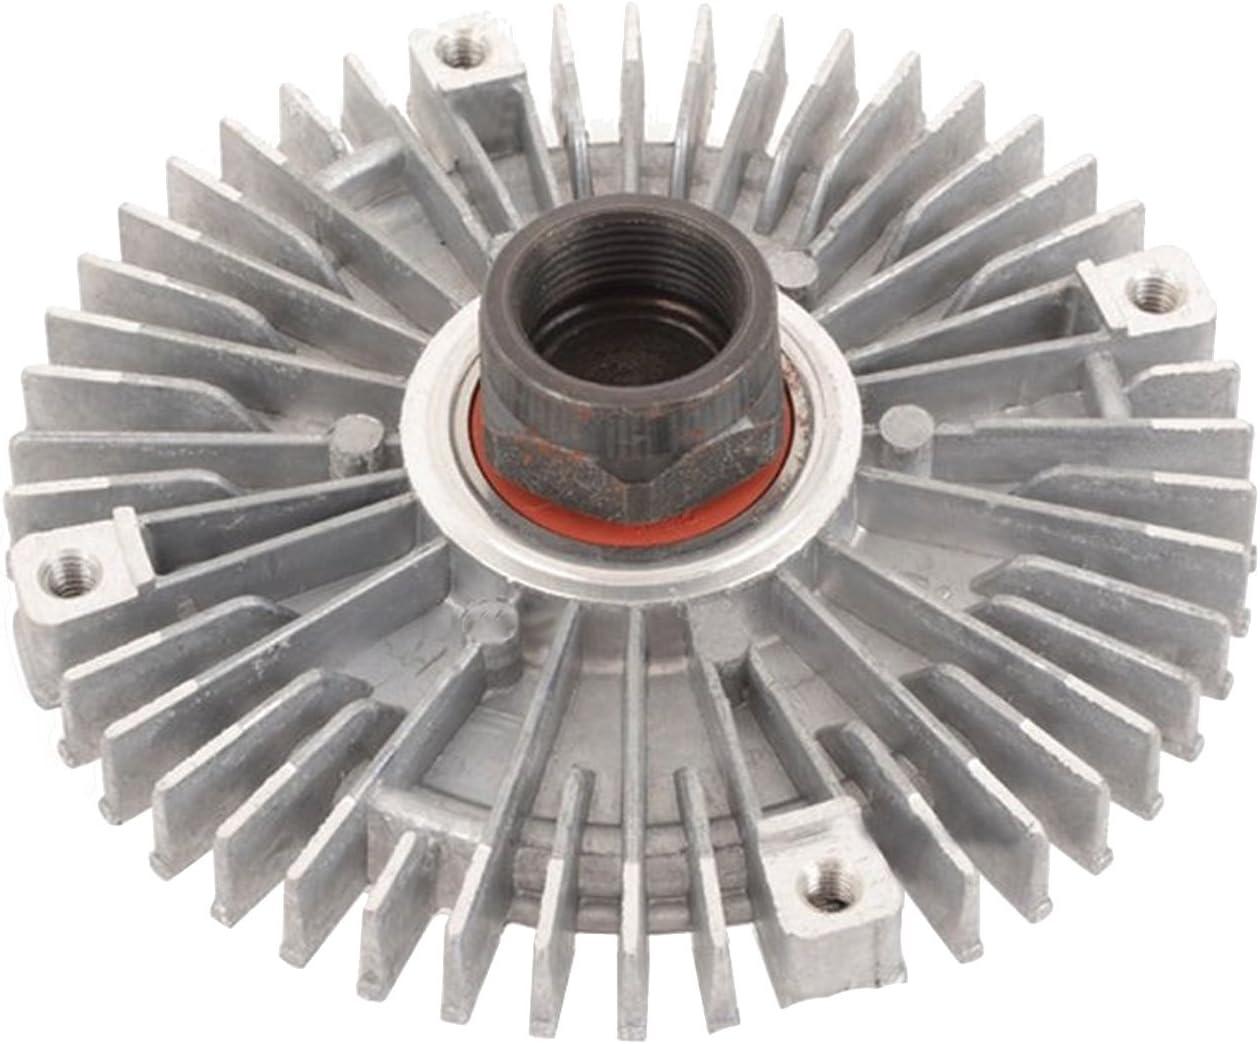 Engine Fan Clutch BMW 318ti 318i Z3 318is 325i 325is 525i 325e 535i Premium